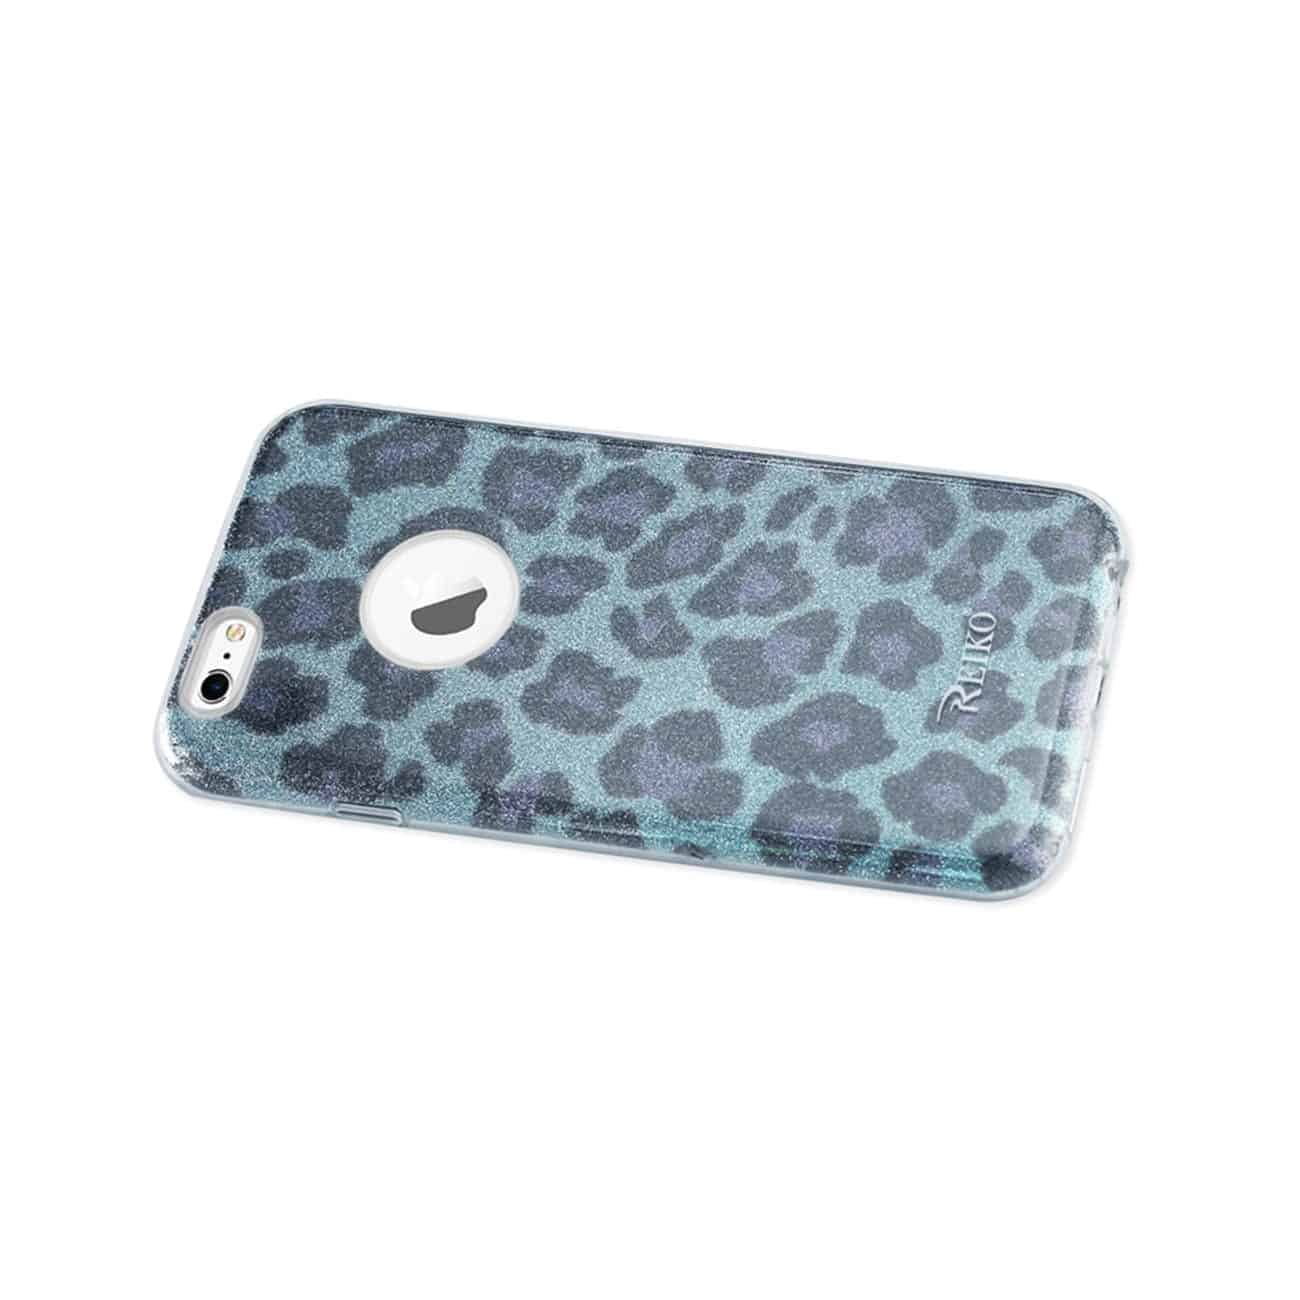 IPHONE 6/ 6S SHINE GLITTER SHIMMER LEOPARD HYBRID CASE IN BLUE